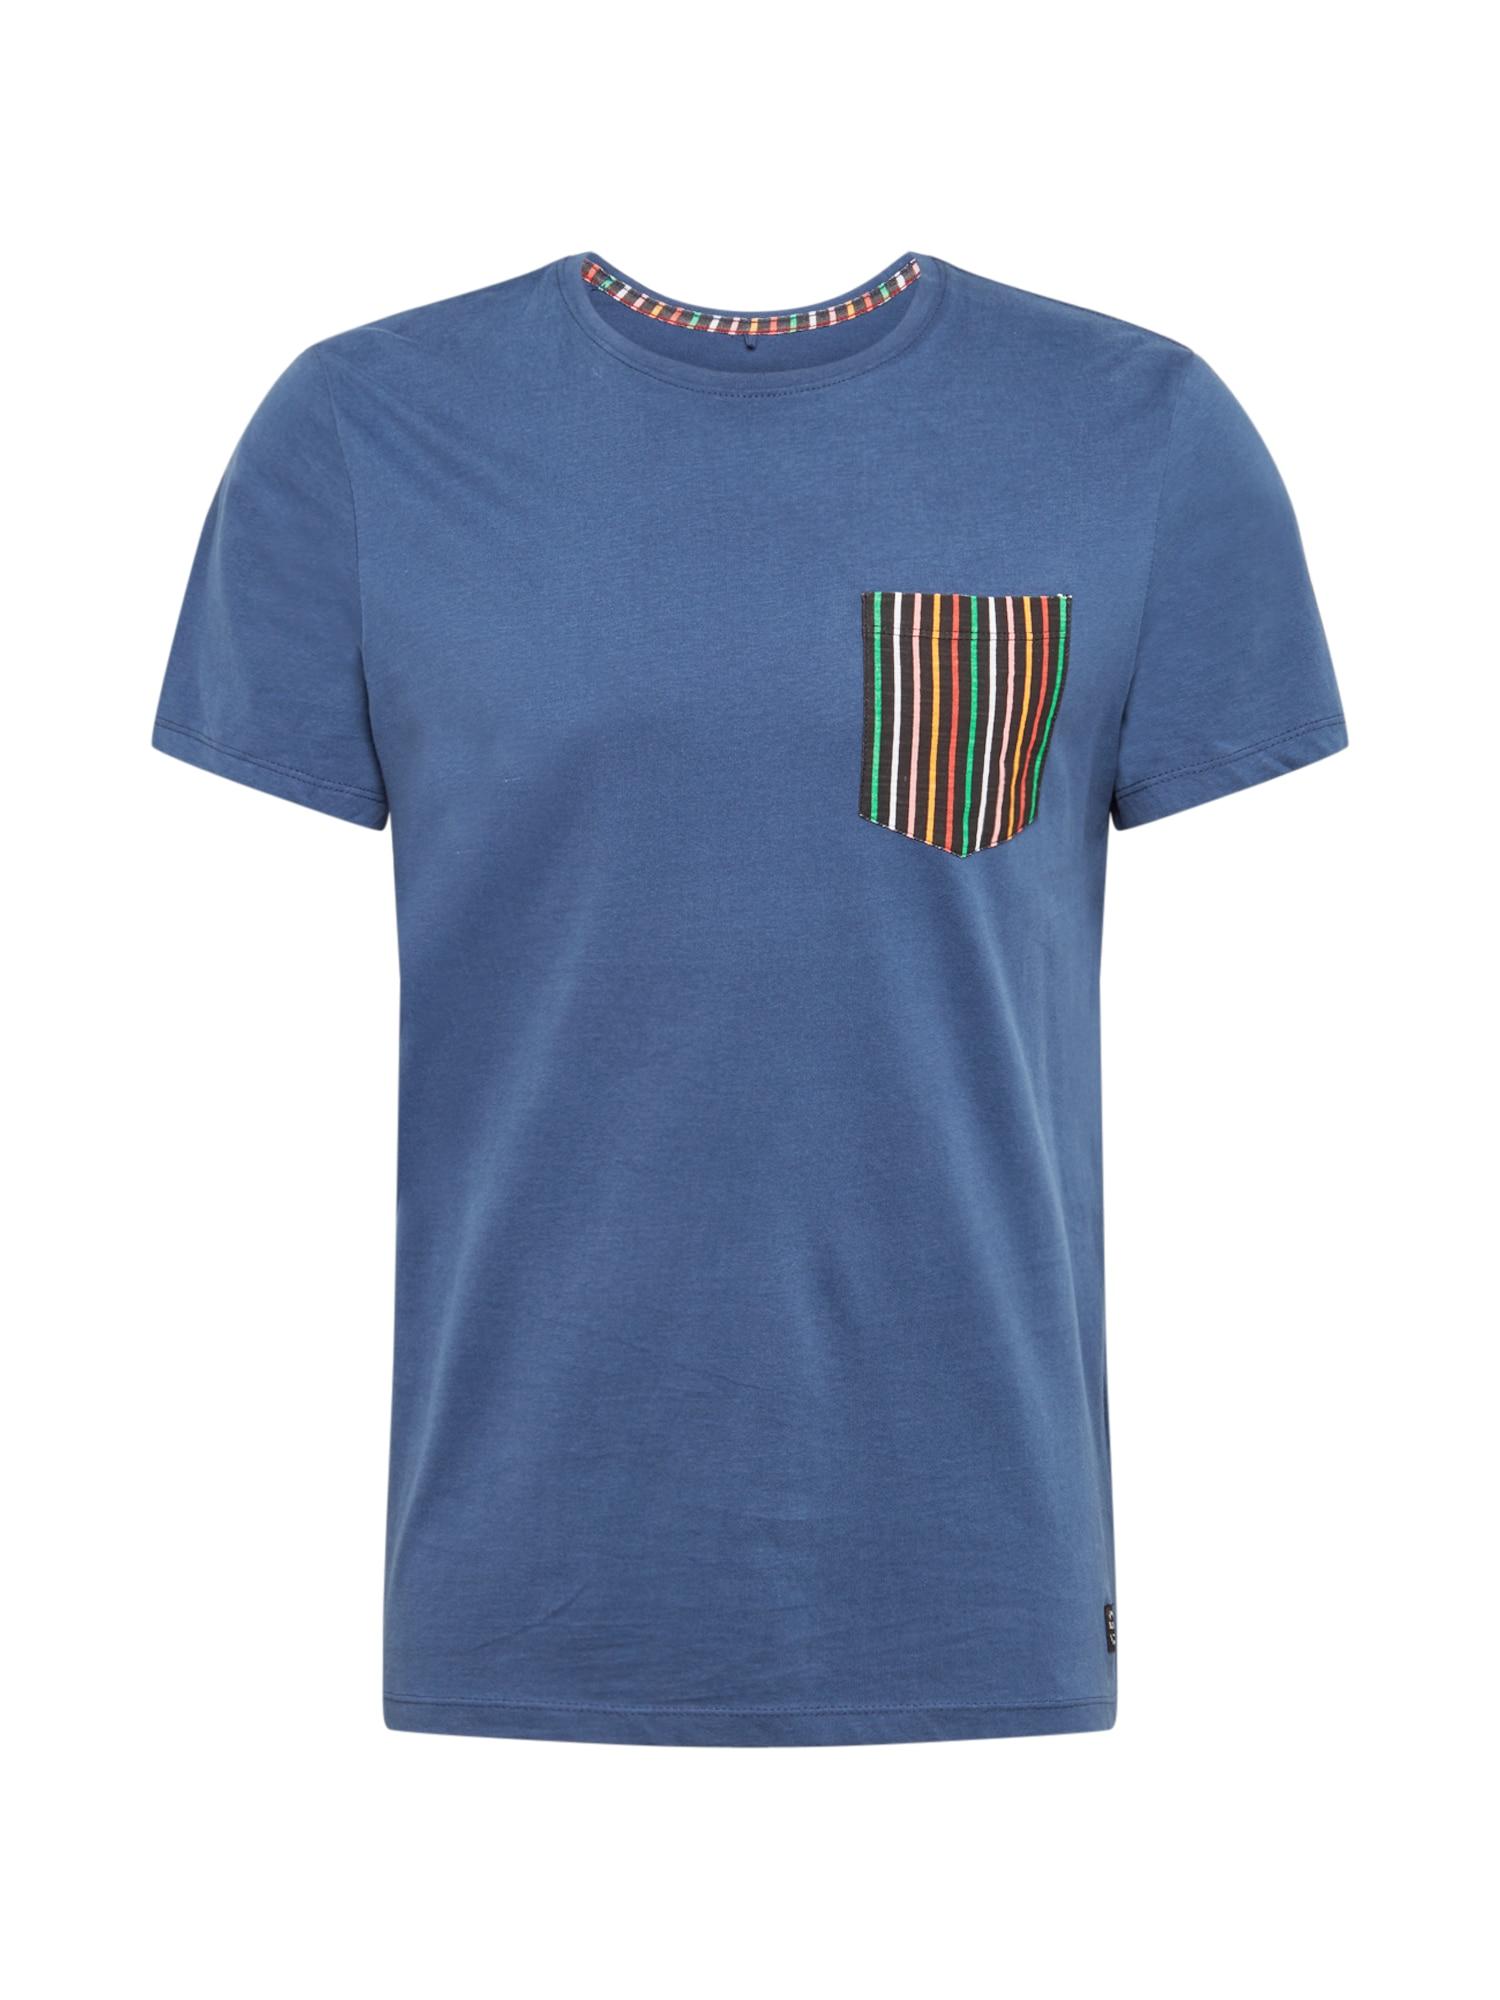 BLEND Tričko 'Tee'  modré